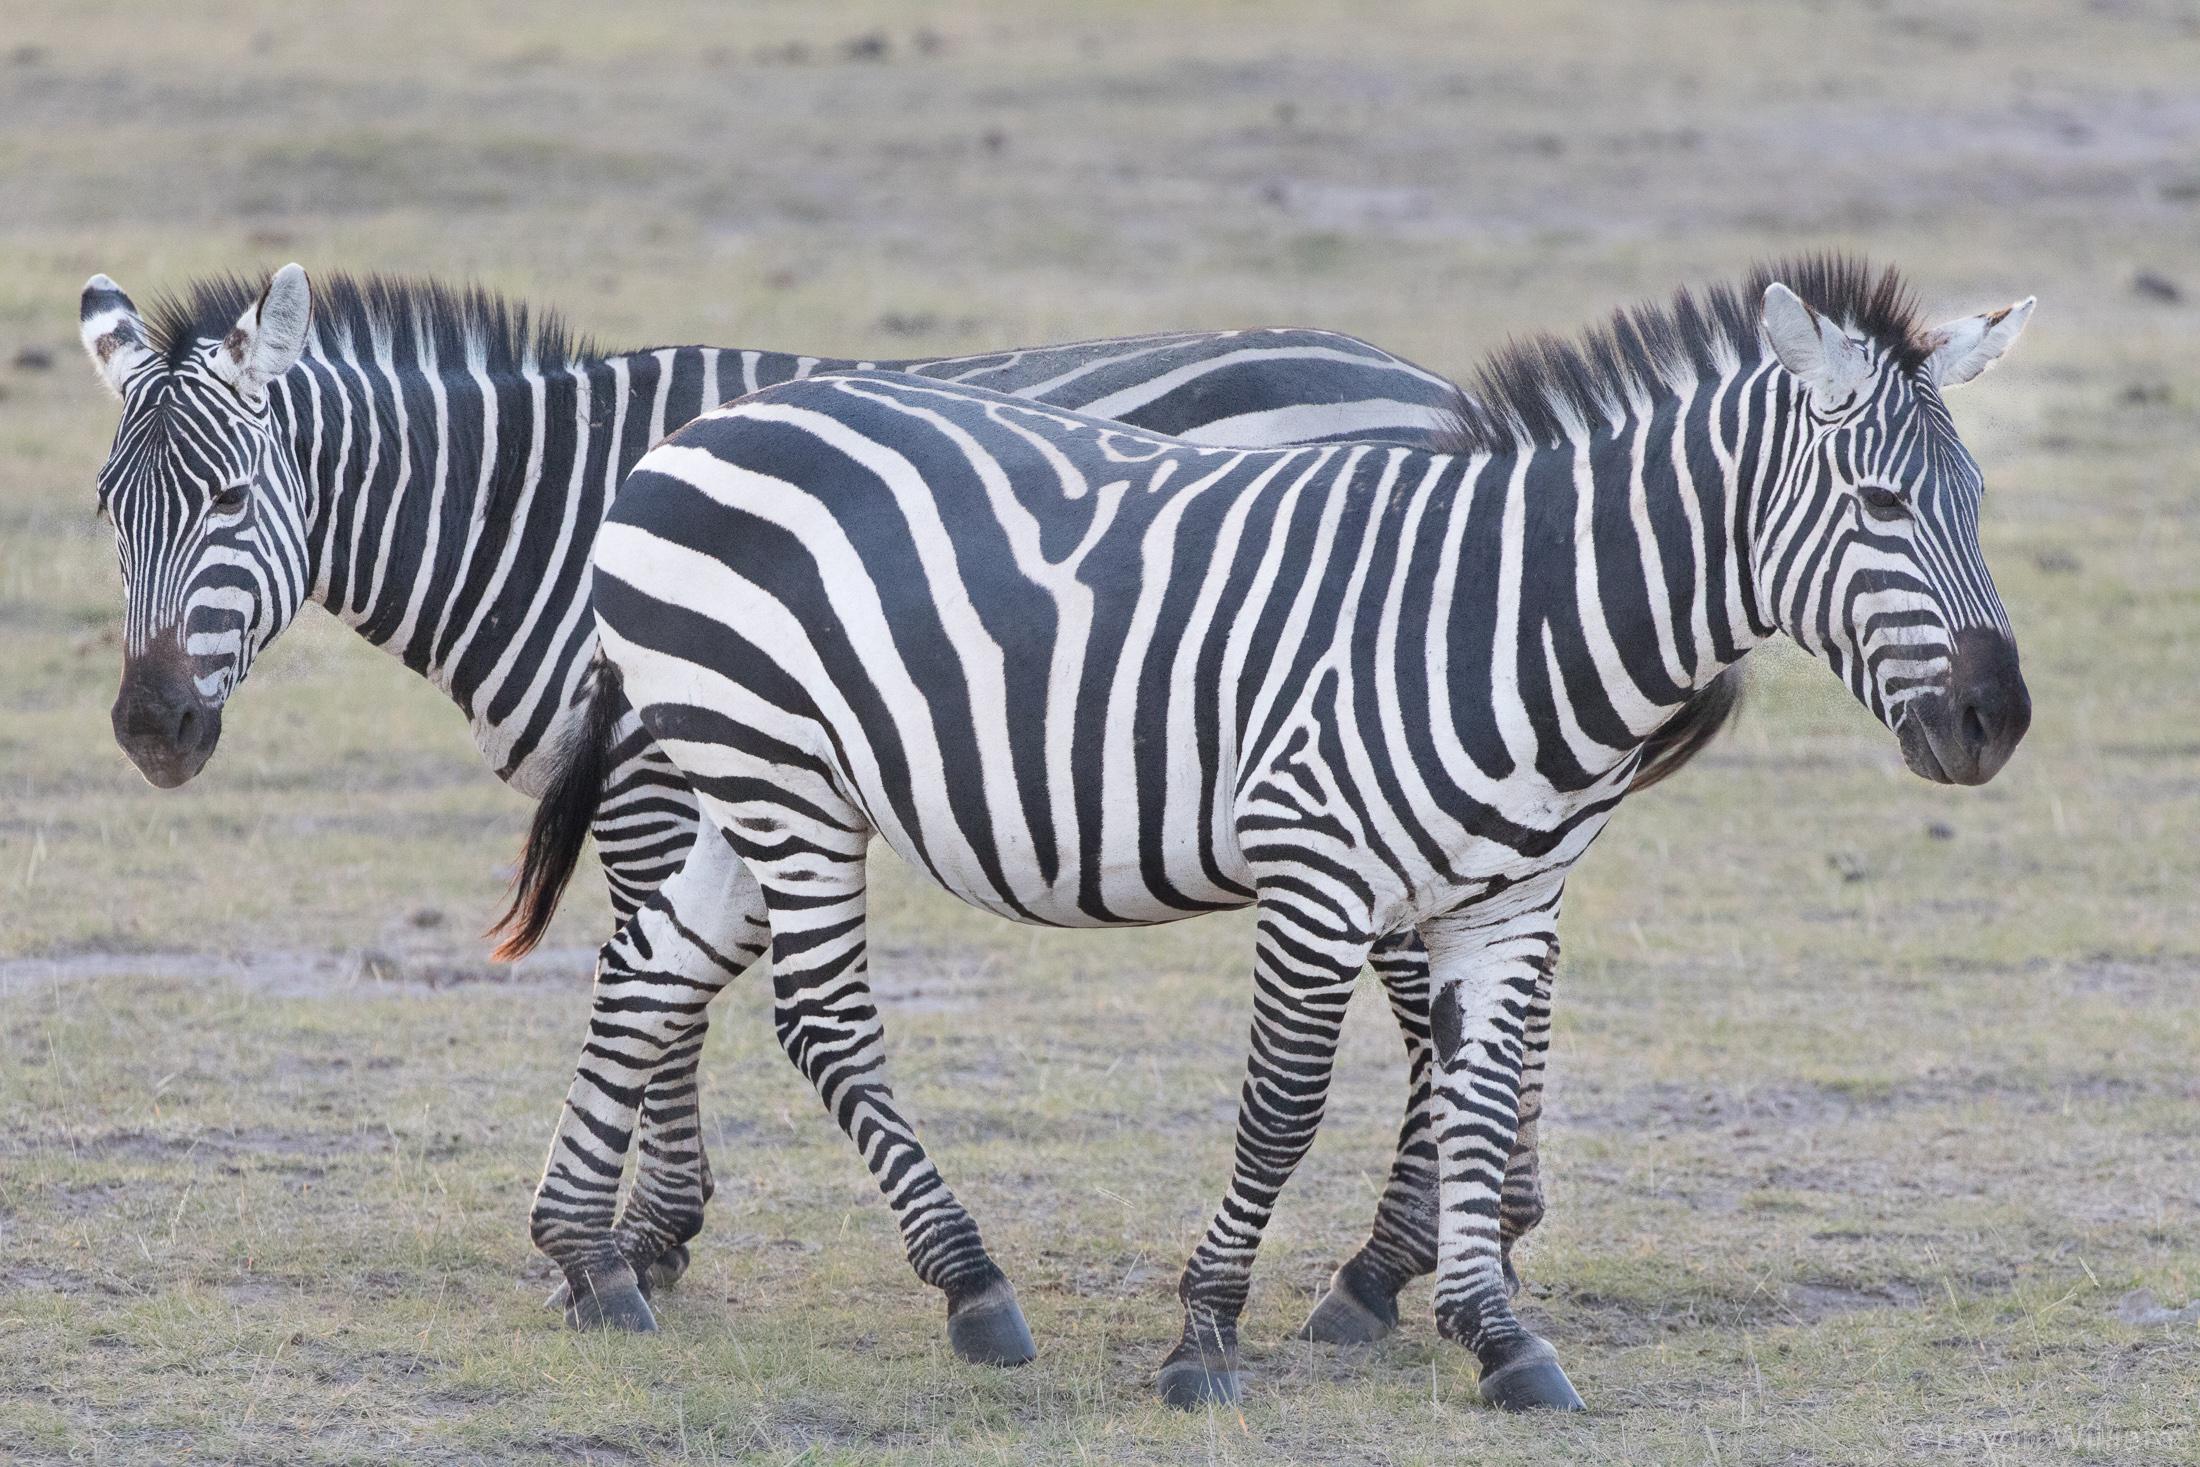 Two zebra. © Haydn Williams 2019